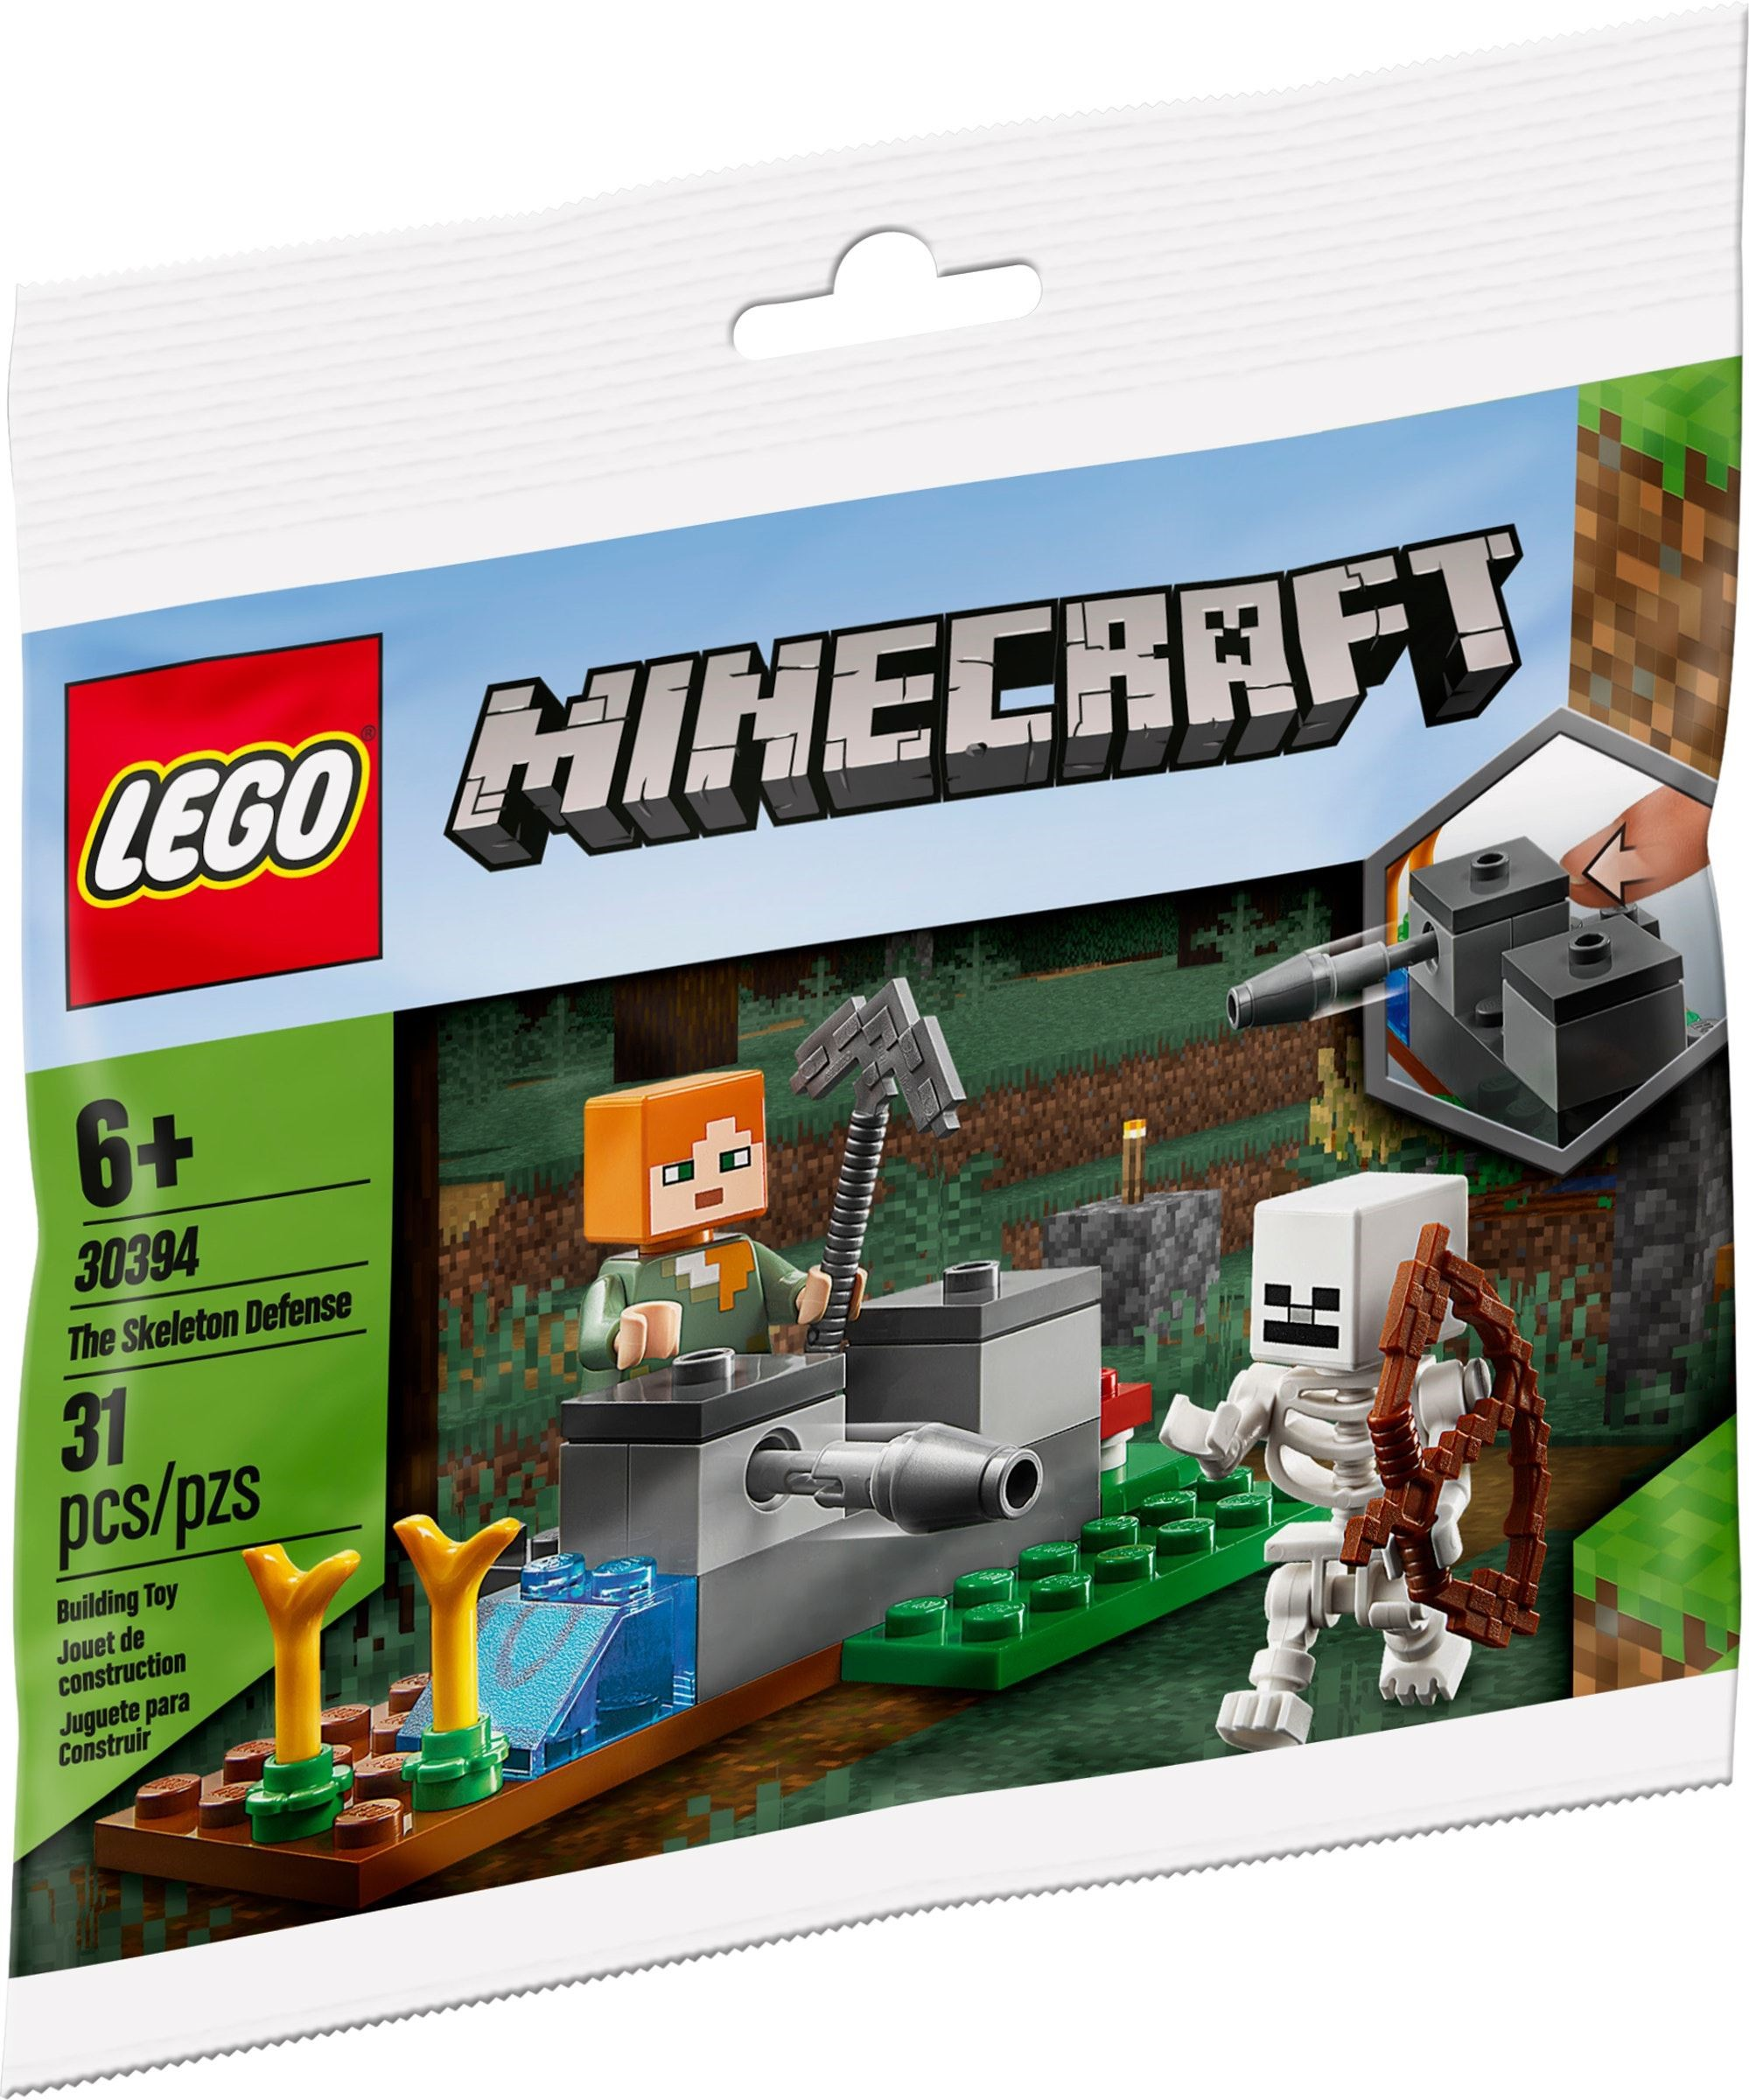 30394 LEGO Minecraft The Skeleton Defense